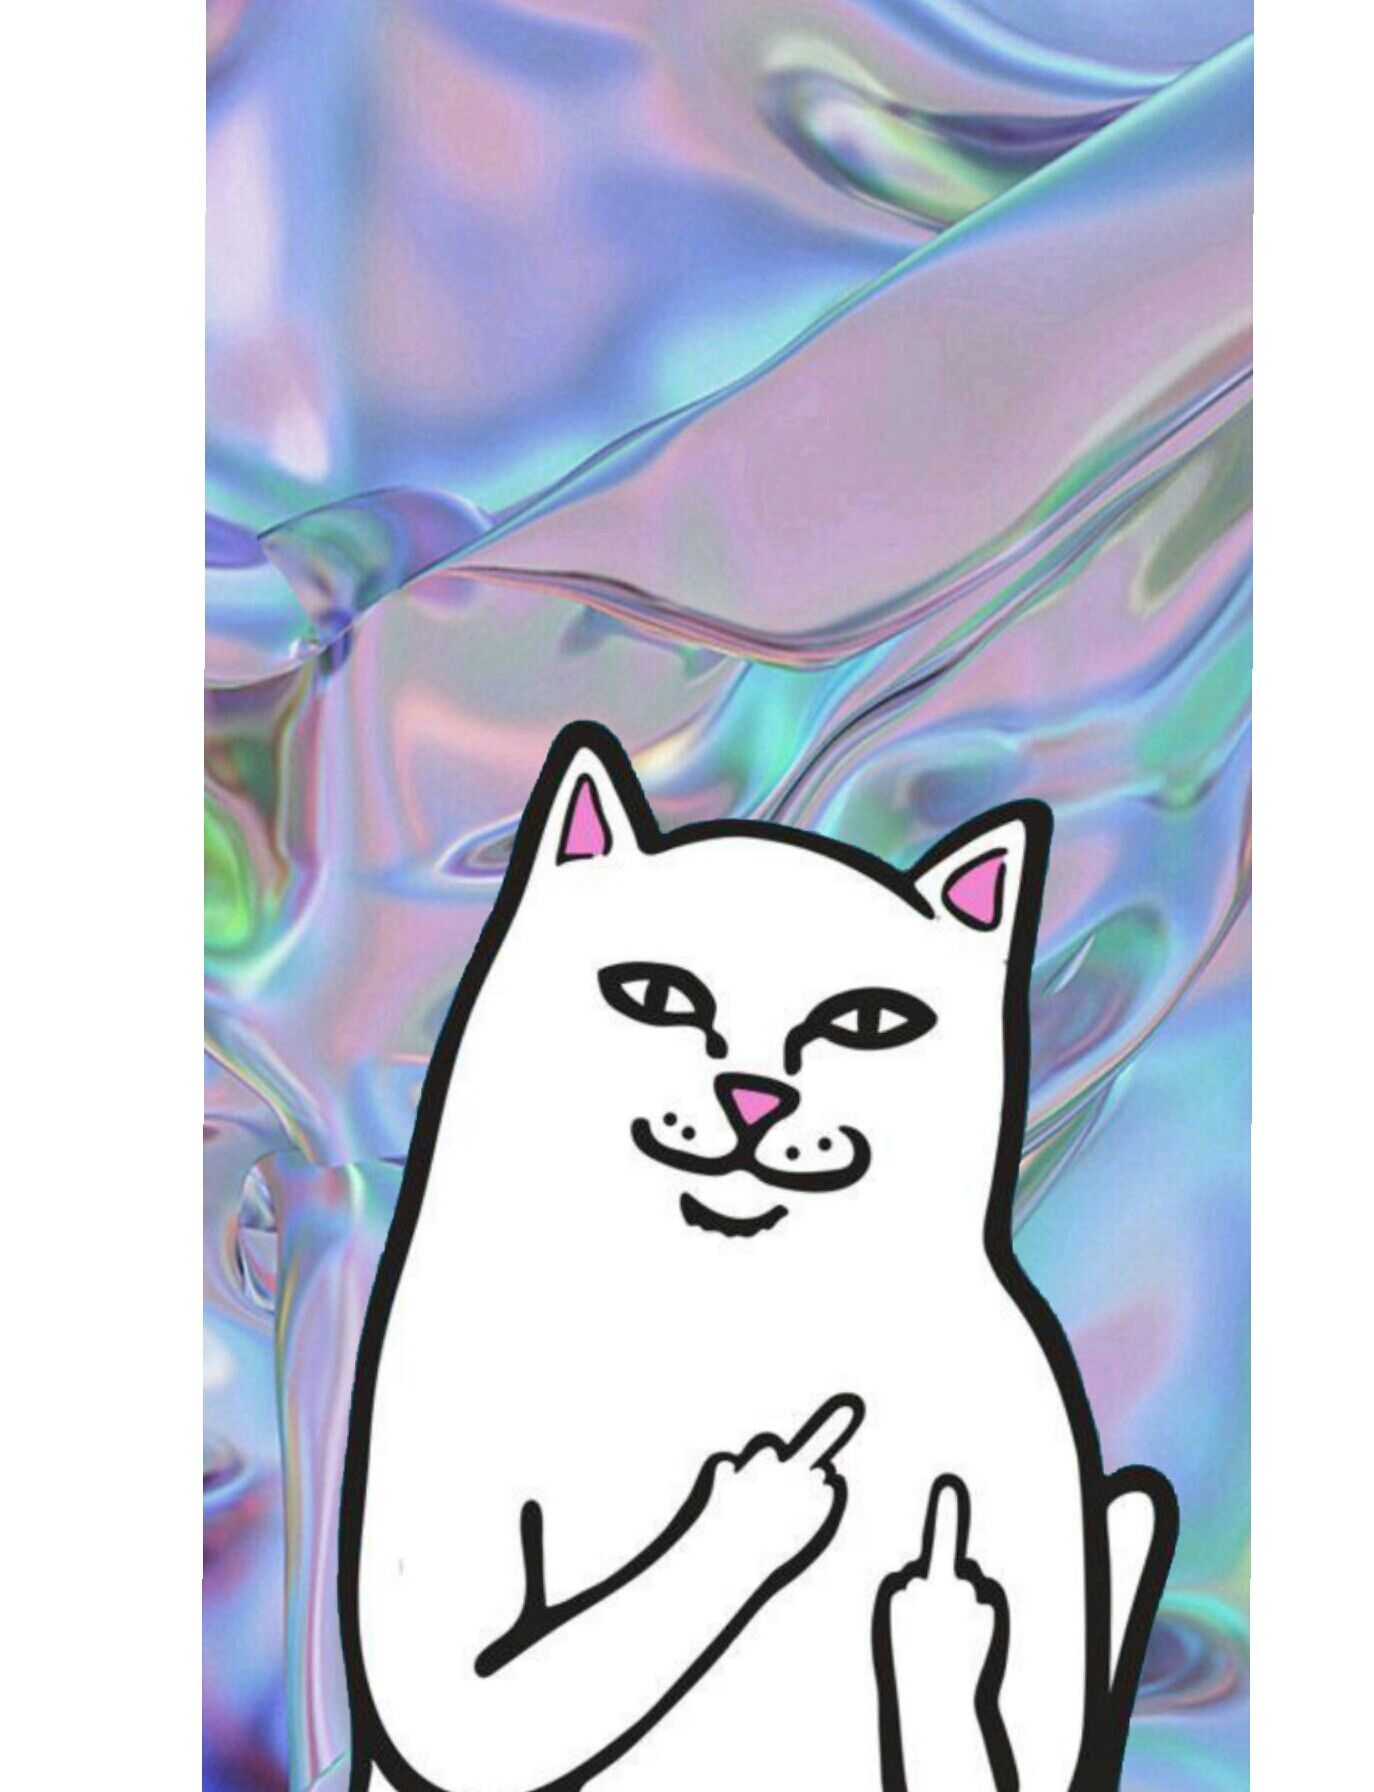 Kitten iphone wallpaper tumblr - Ripndip Ripndip Wallpaper